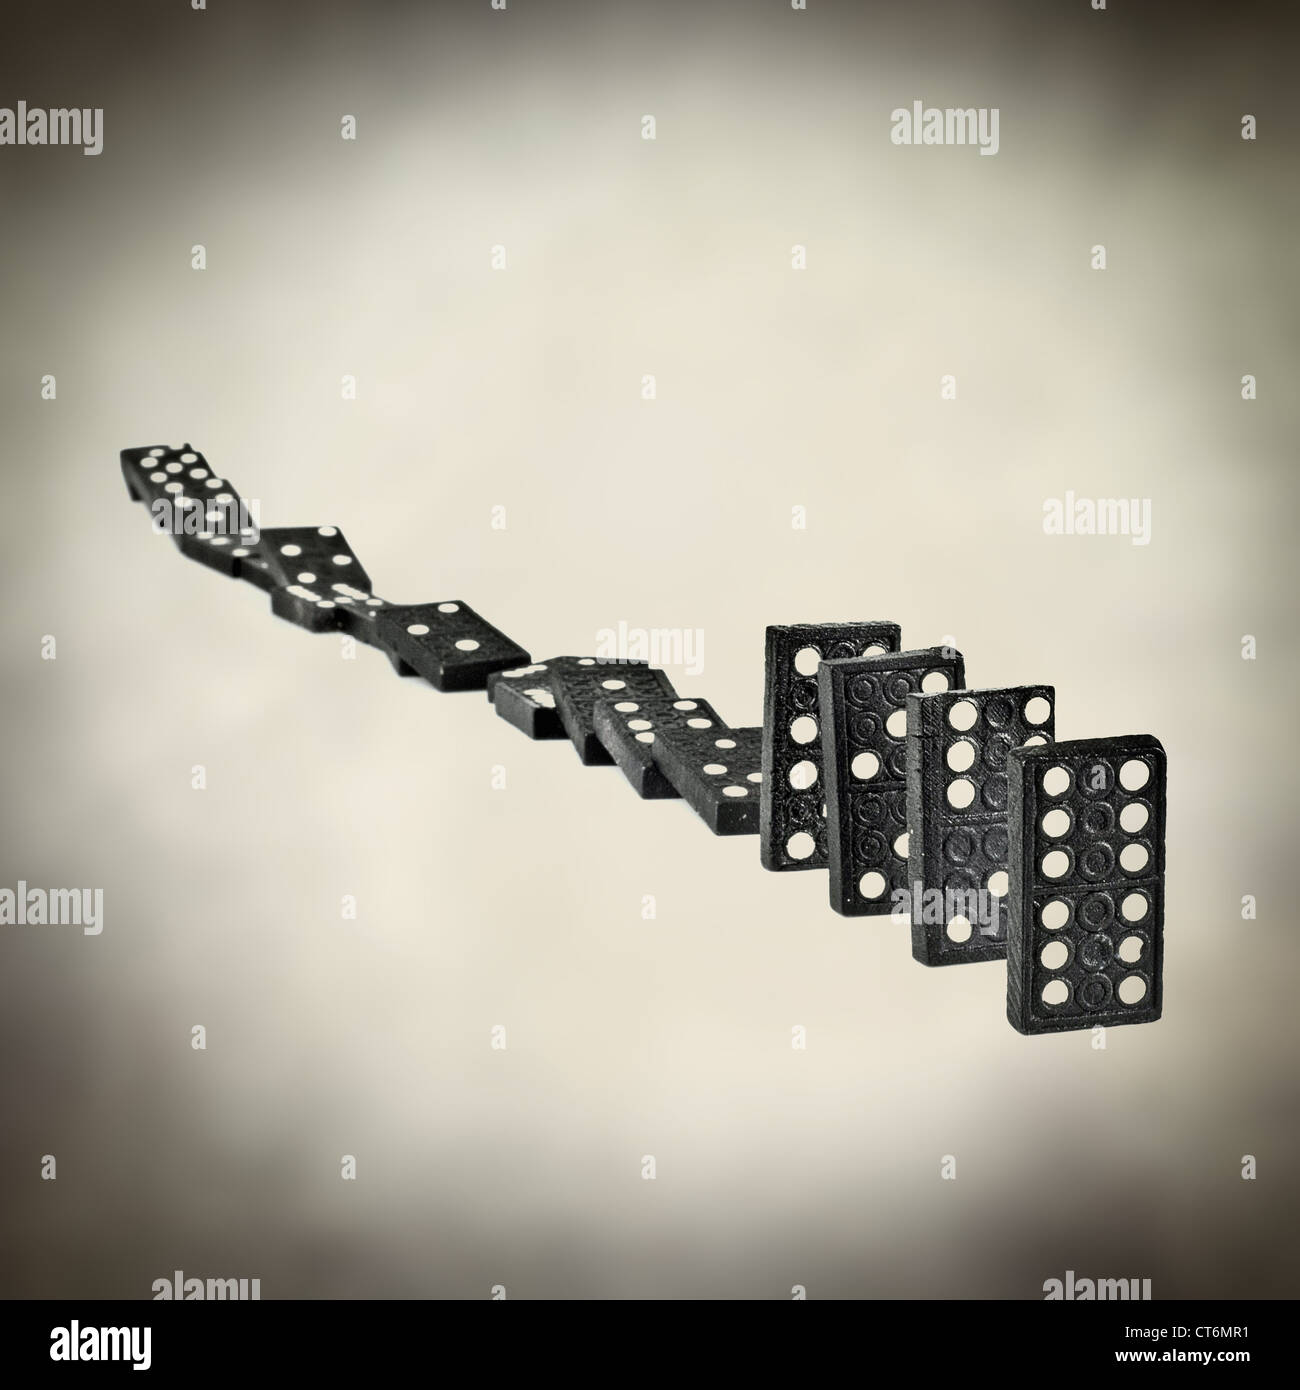 domino effect - Stock Image